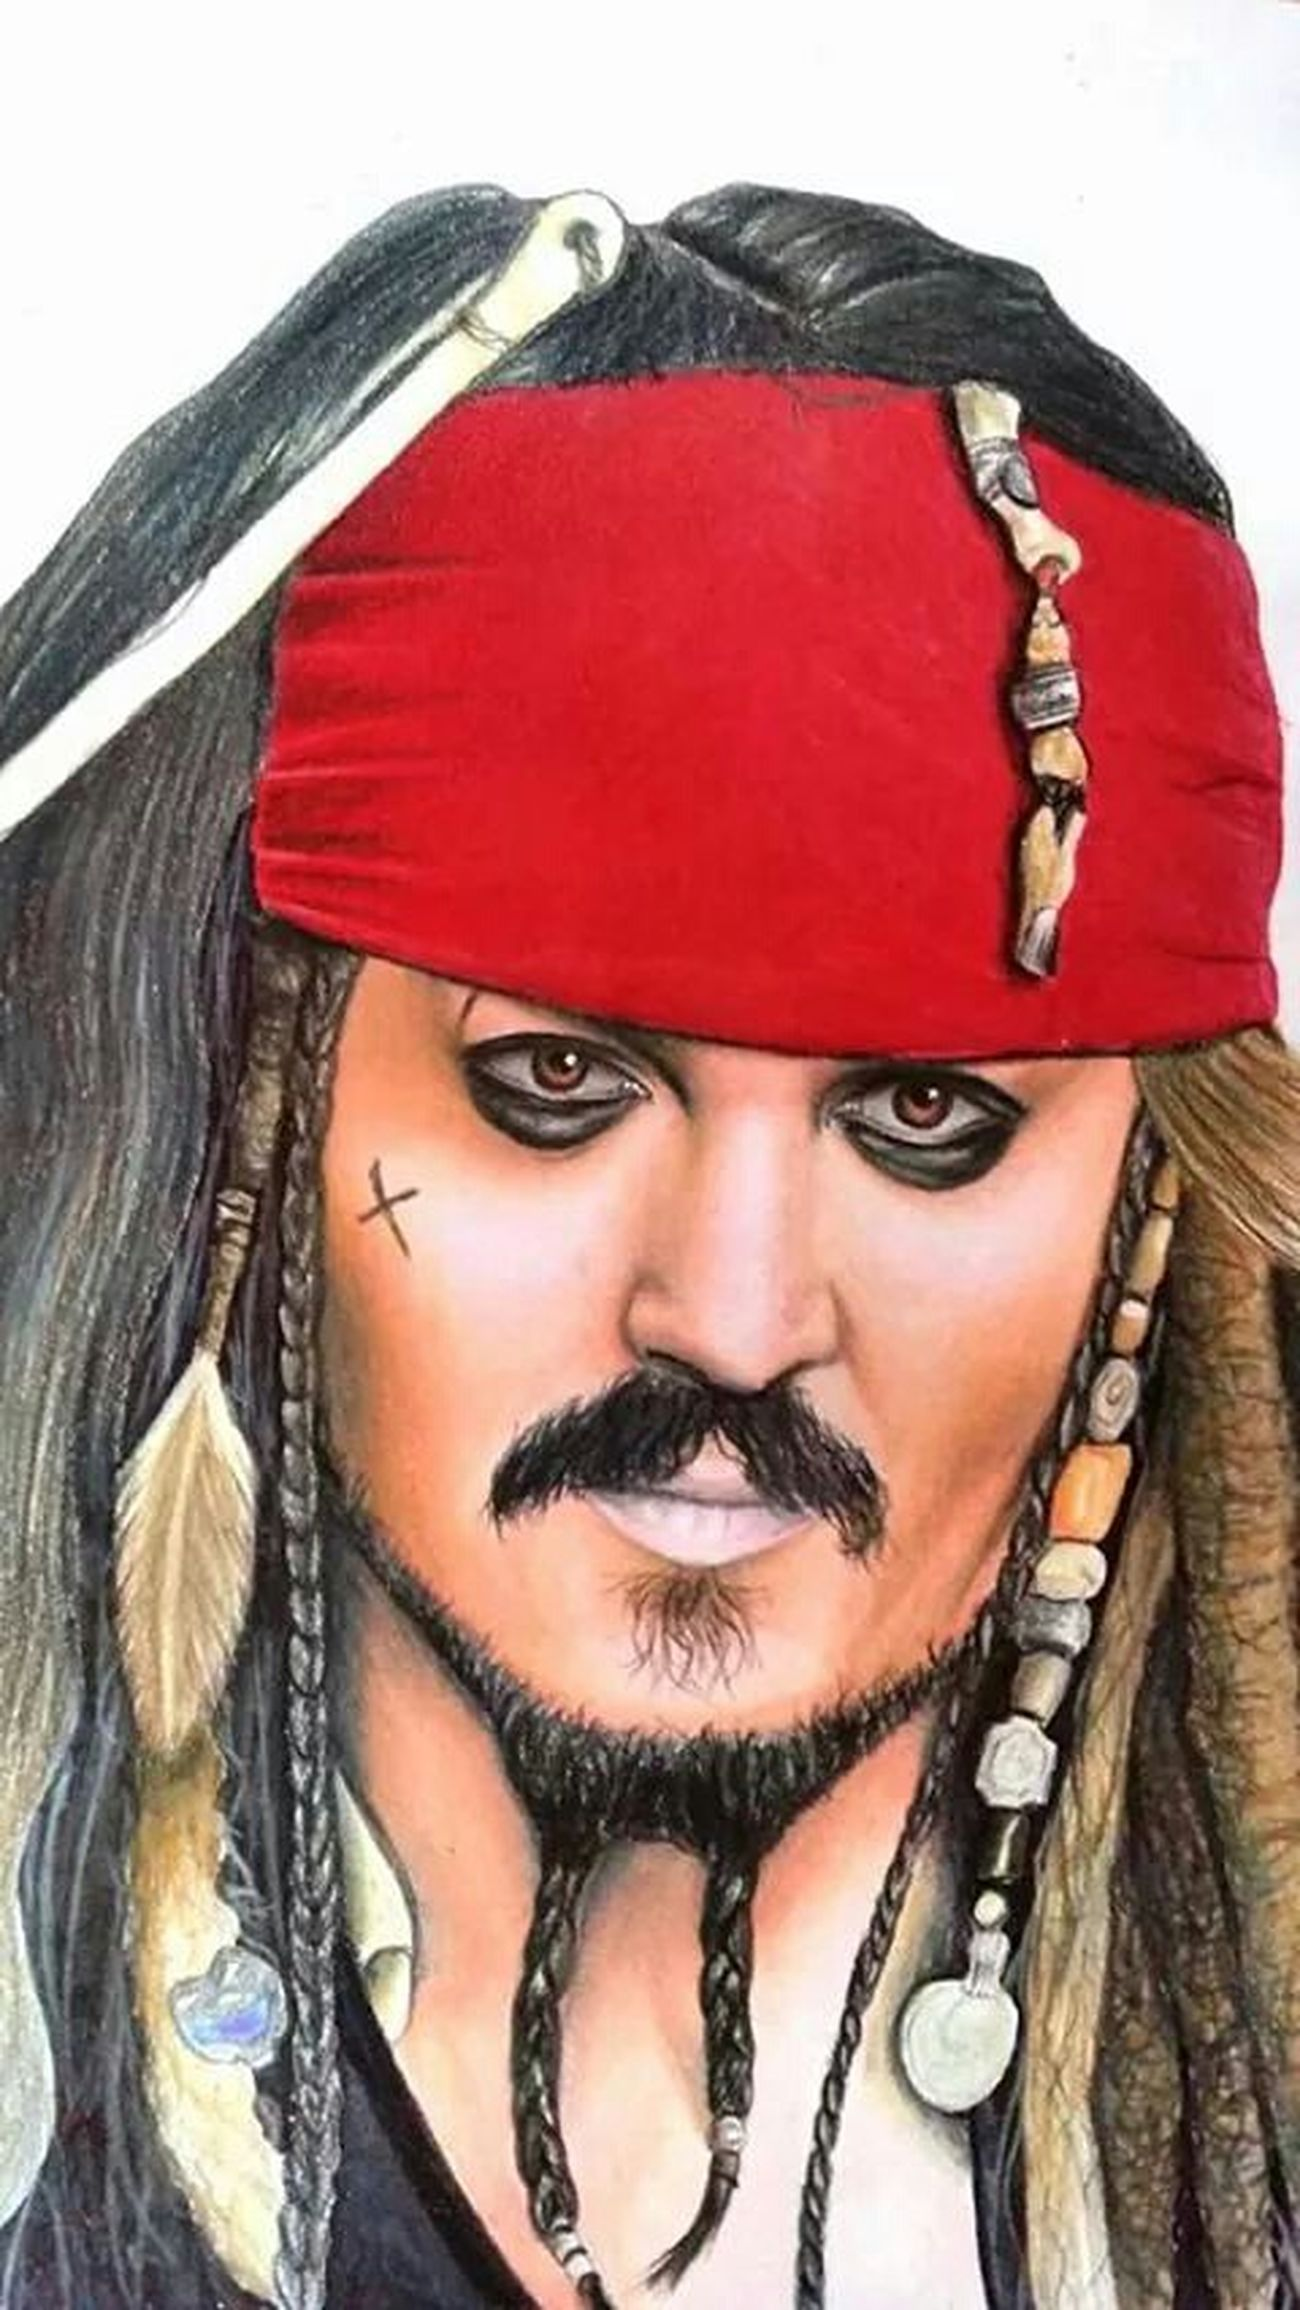 Piratideicaraibiaiconfinidelmondo JackSparrow Jonny Depp